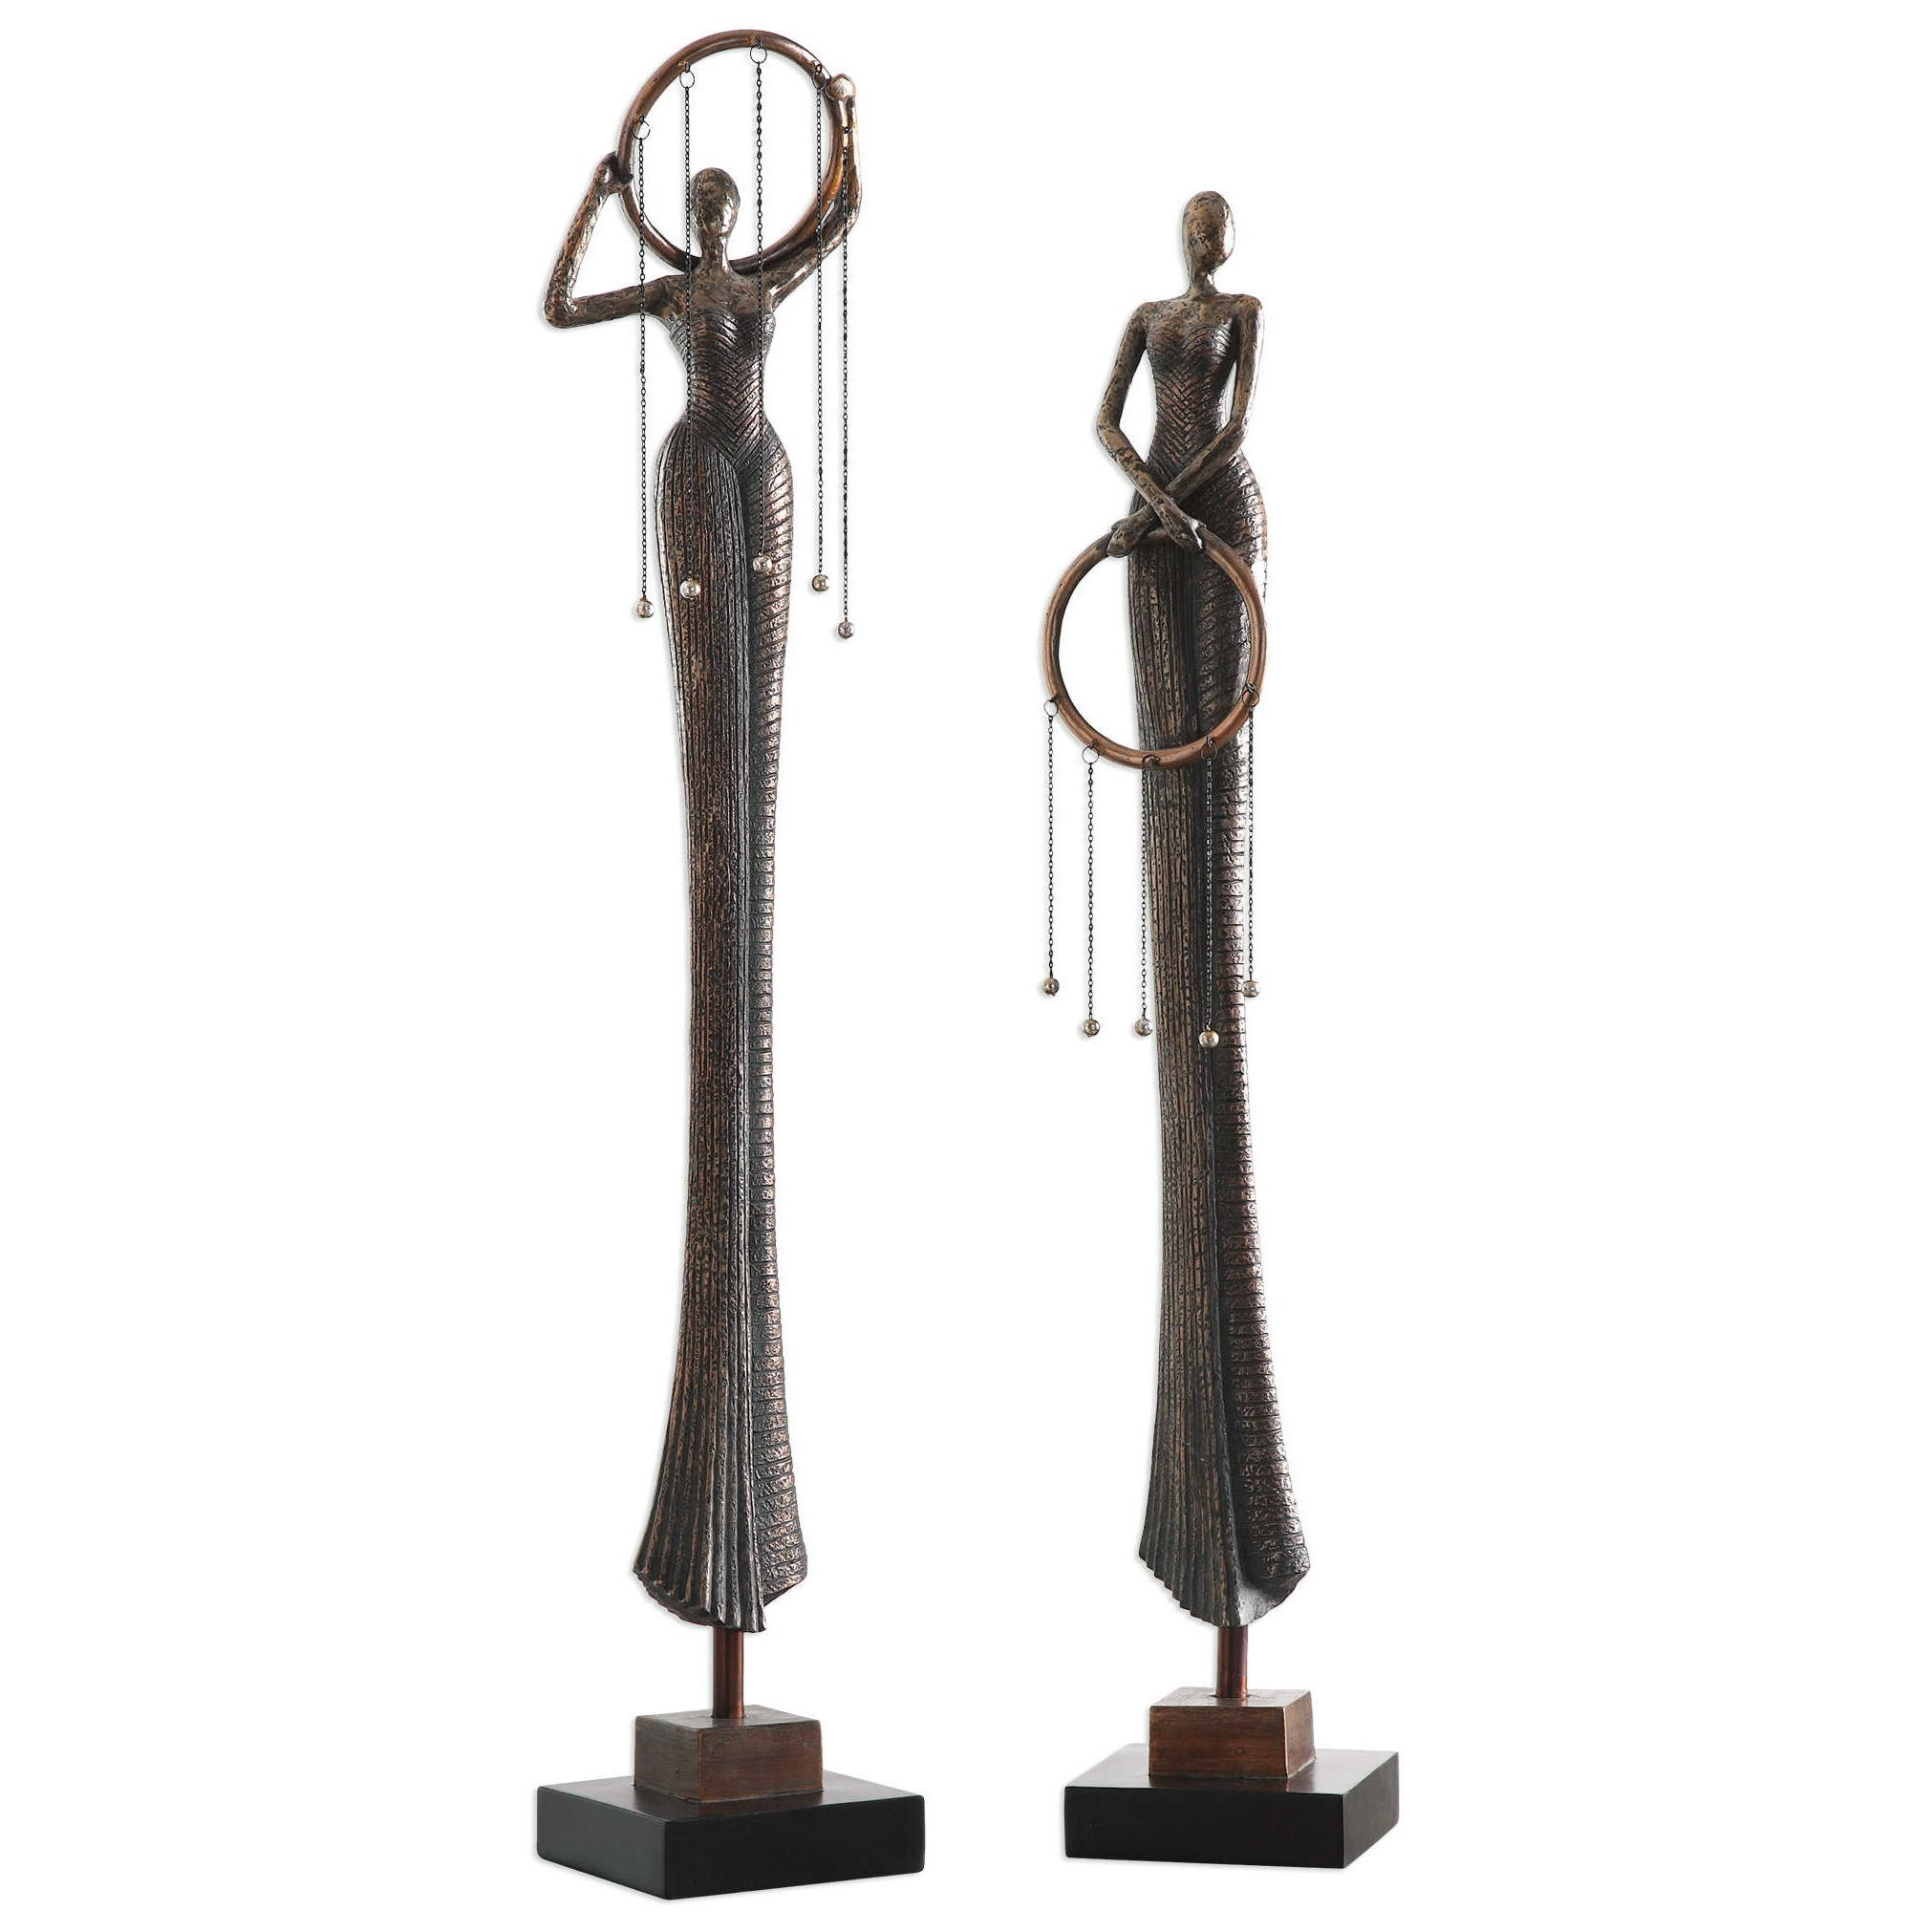 Uttermost Accessories Ring Dance Sculpture (Set of 2) - Item Number: 20194